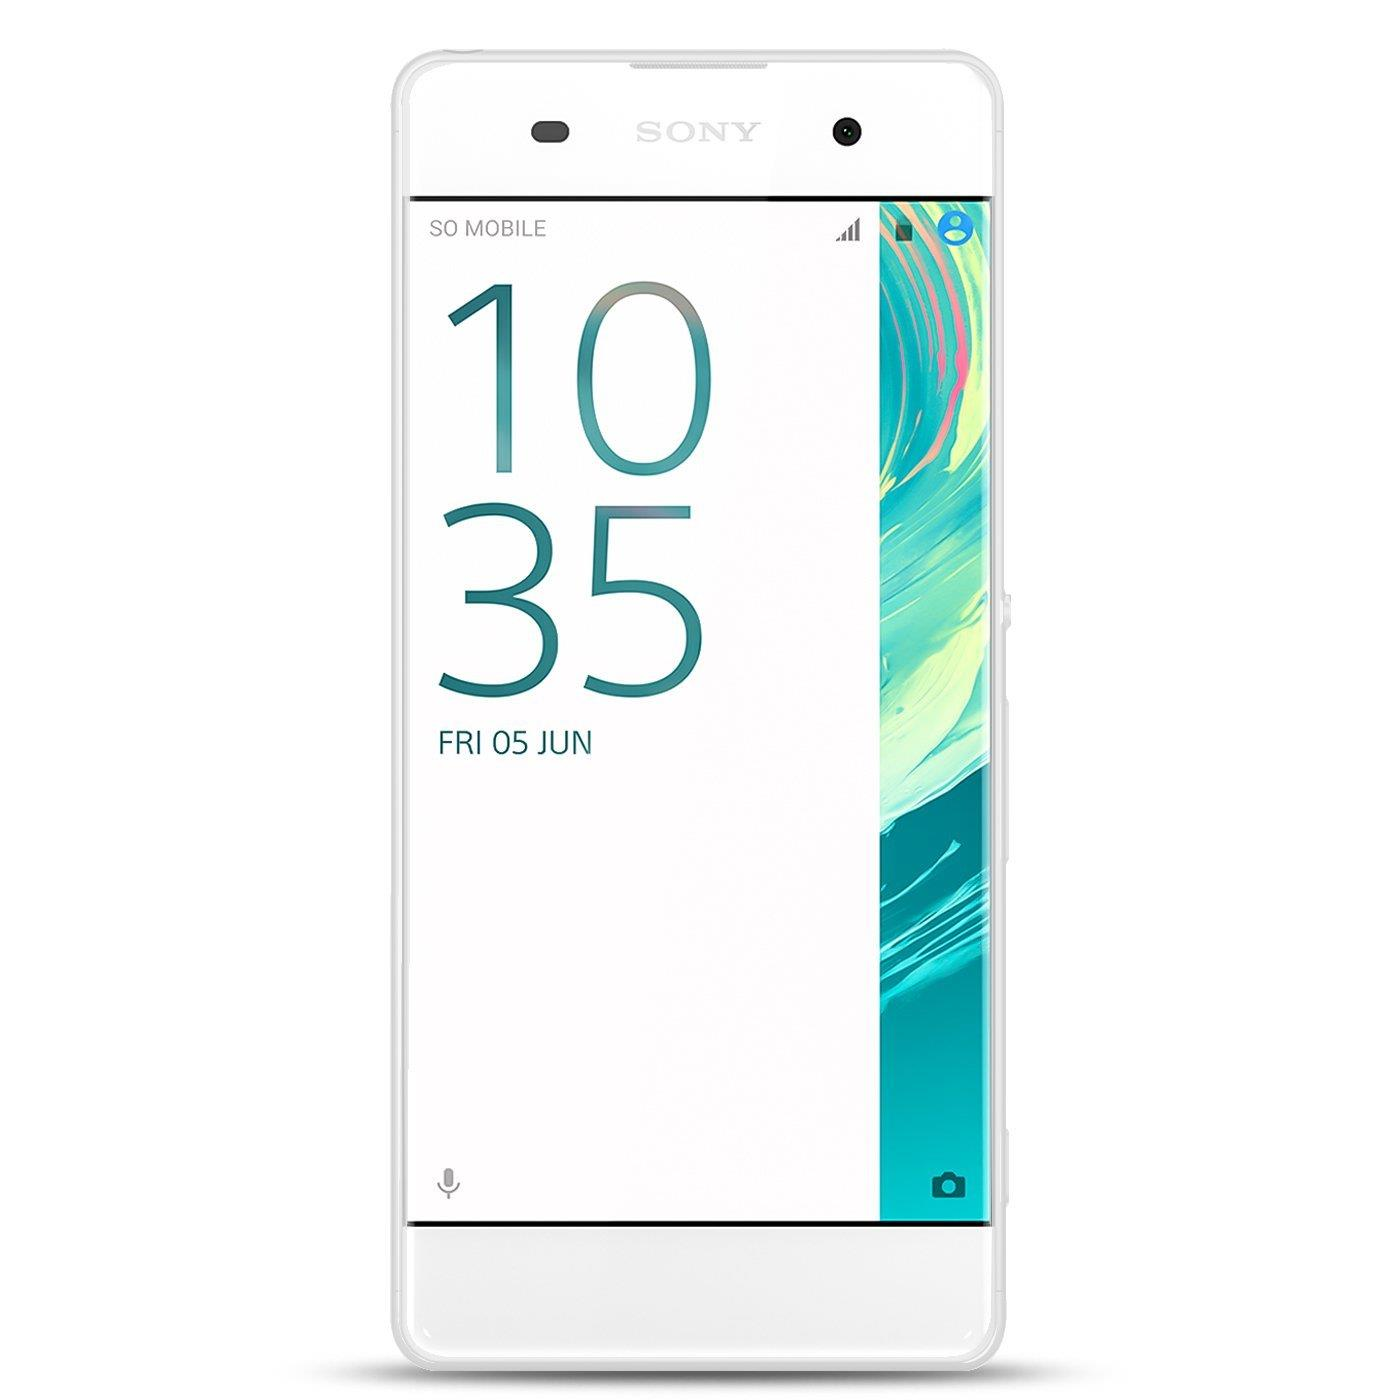 Sony-Xperia-X-Silikon-Gel-S-Line-Case-Cover-Ultra-Thin-Slim-Back-Bumper Indexbild 28